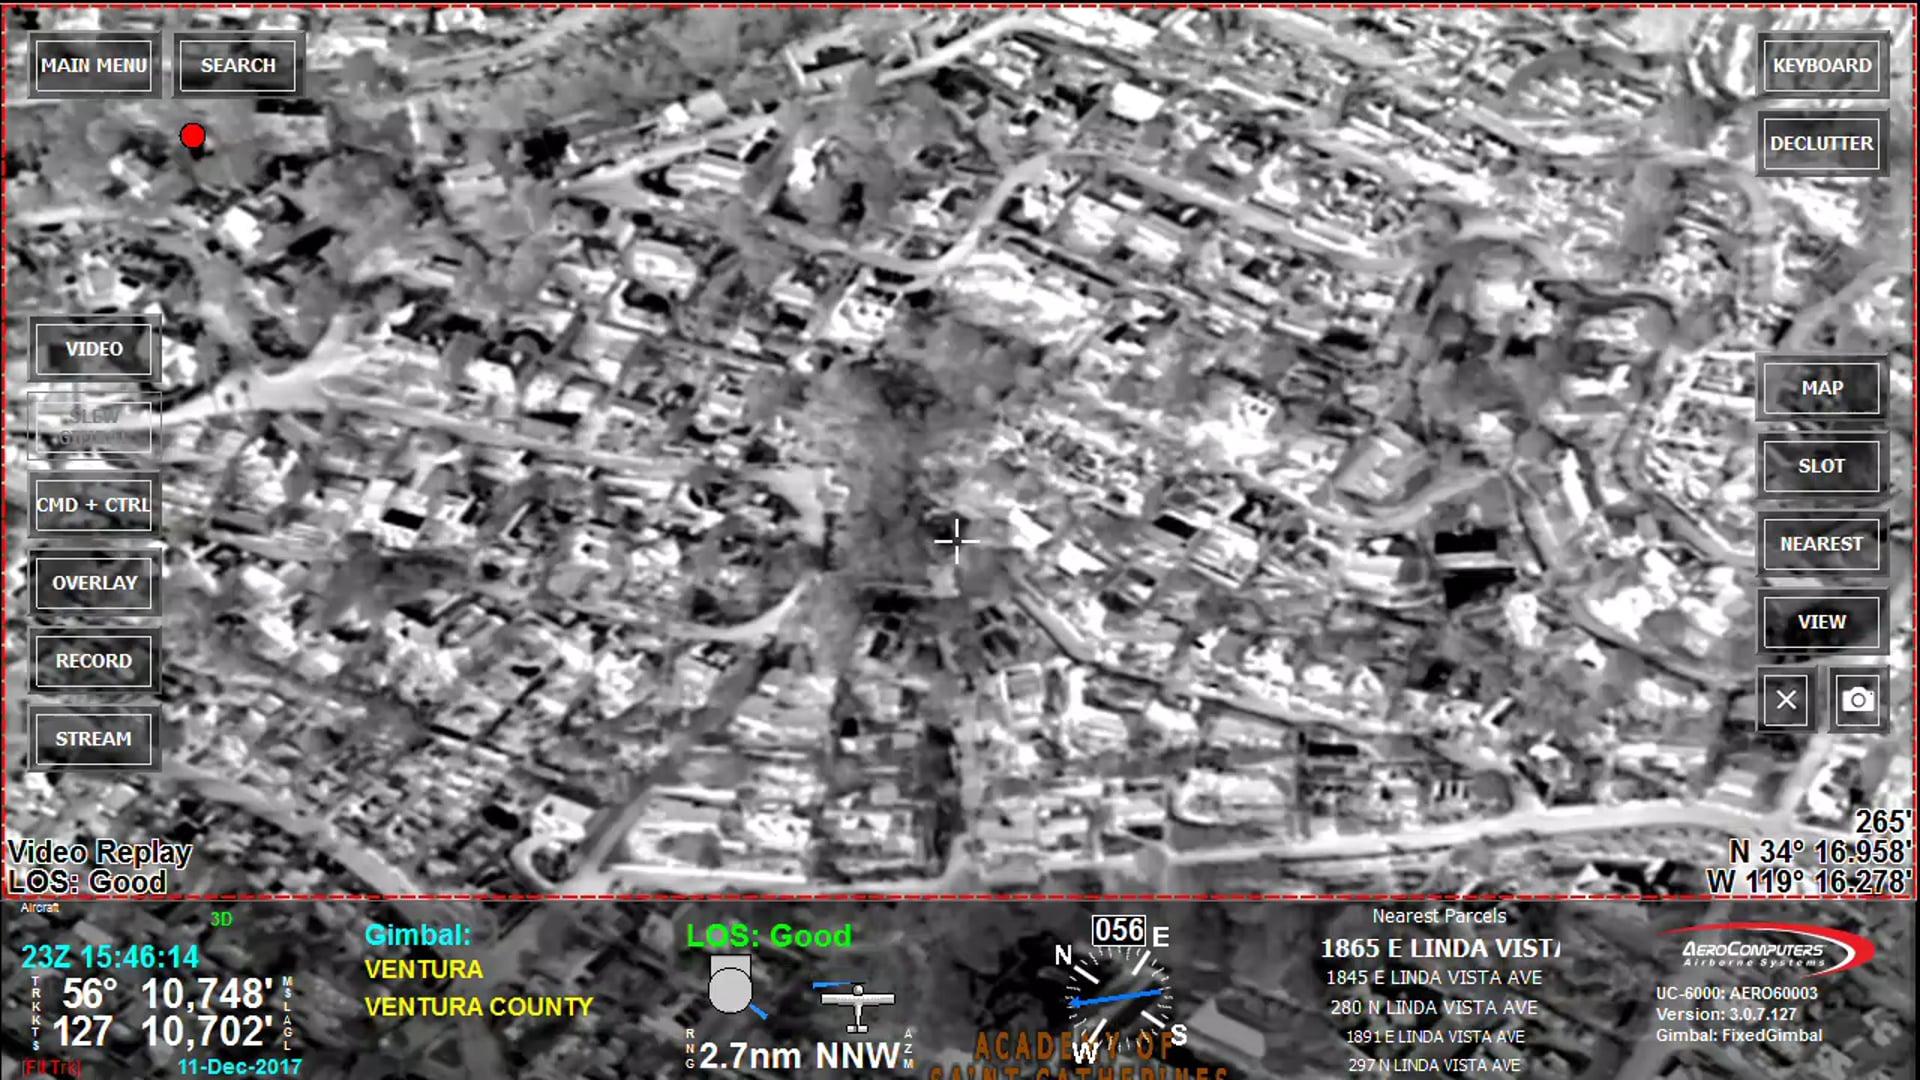 UC-6000 Thomas Fire Damage Assessment on Terrace Drive, Ventura, CA